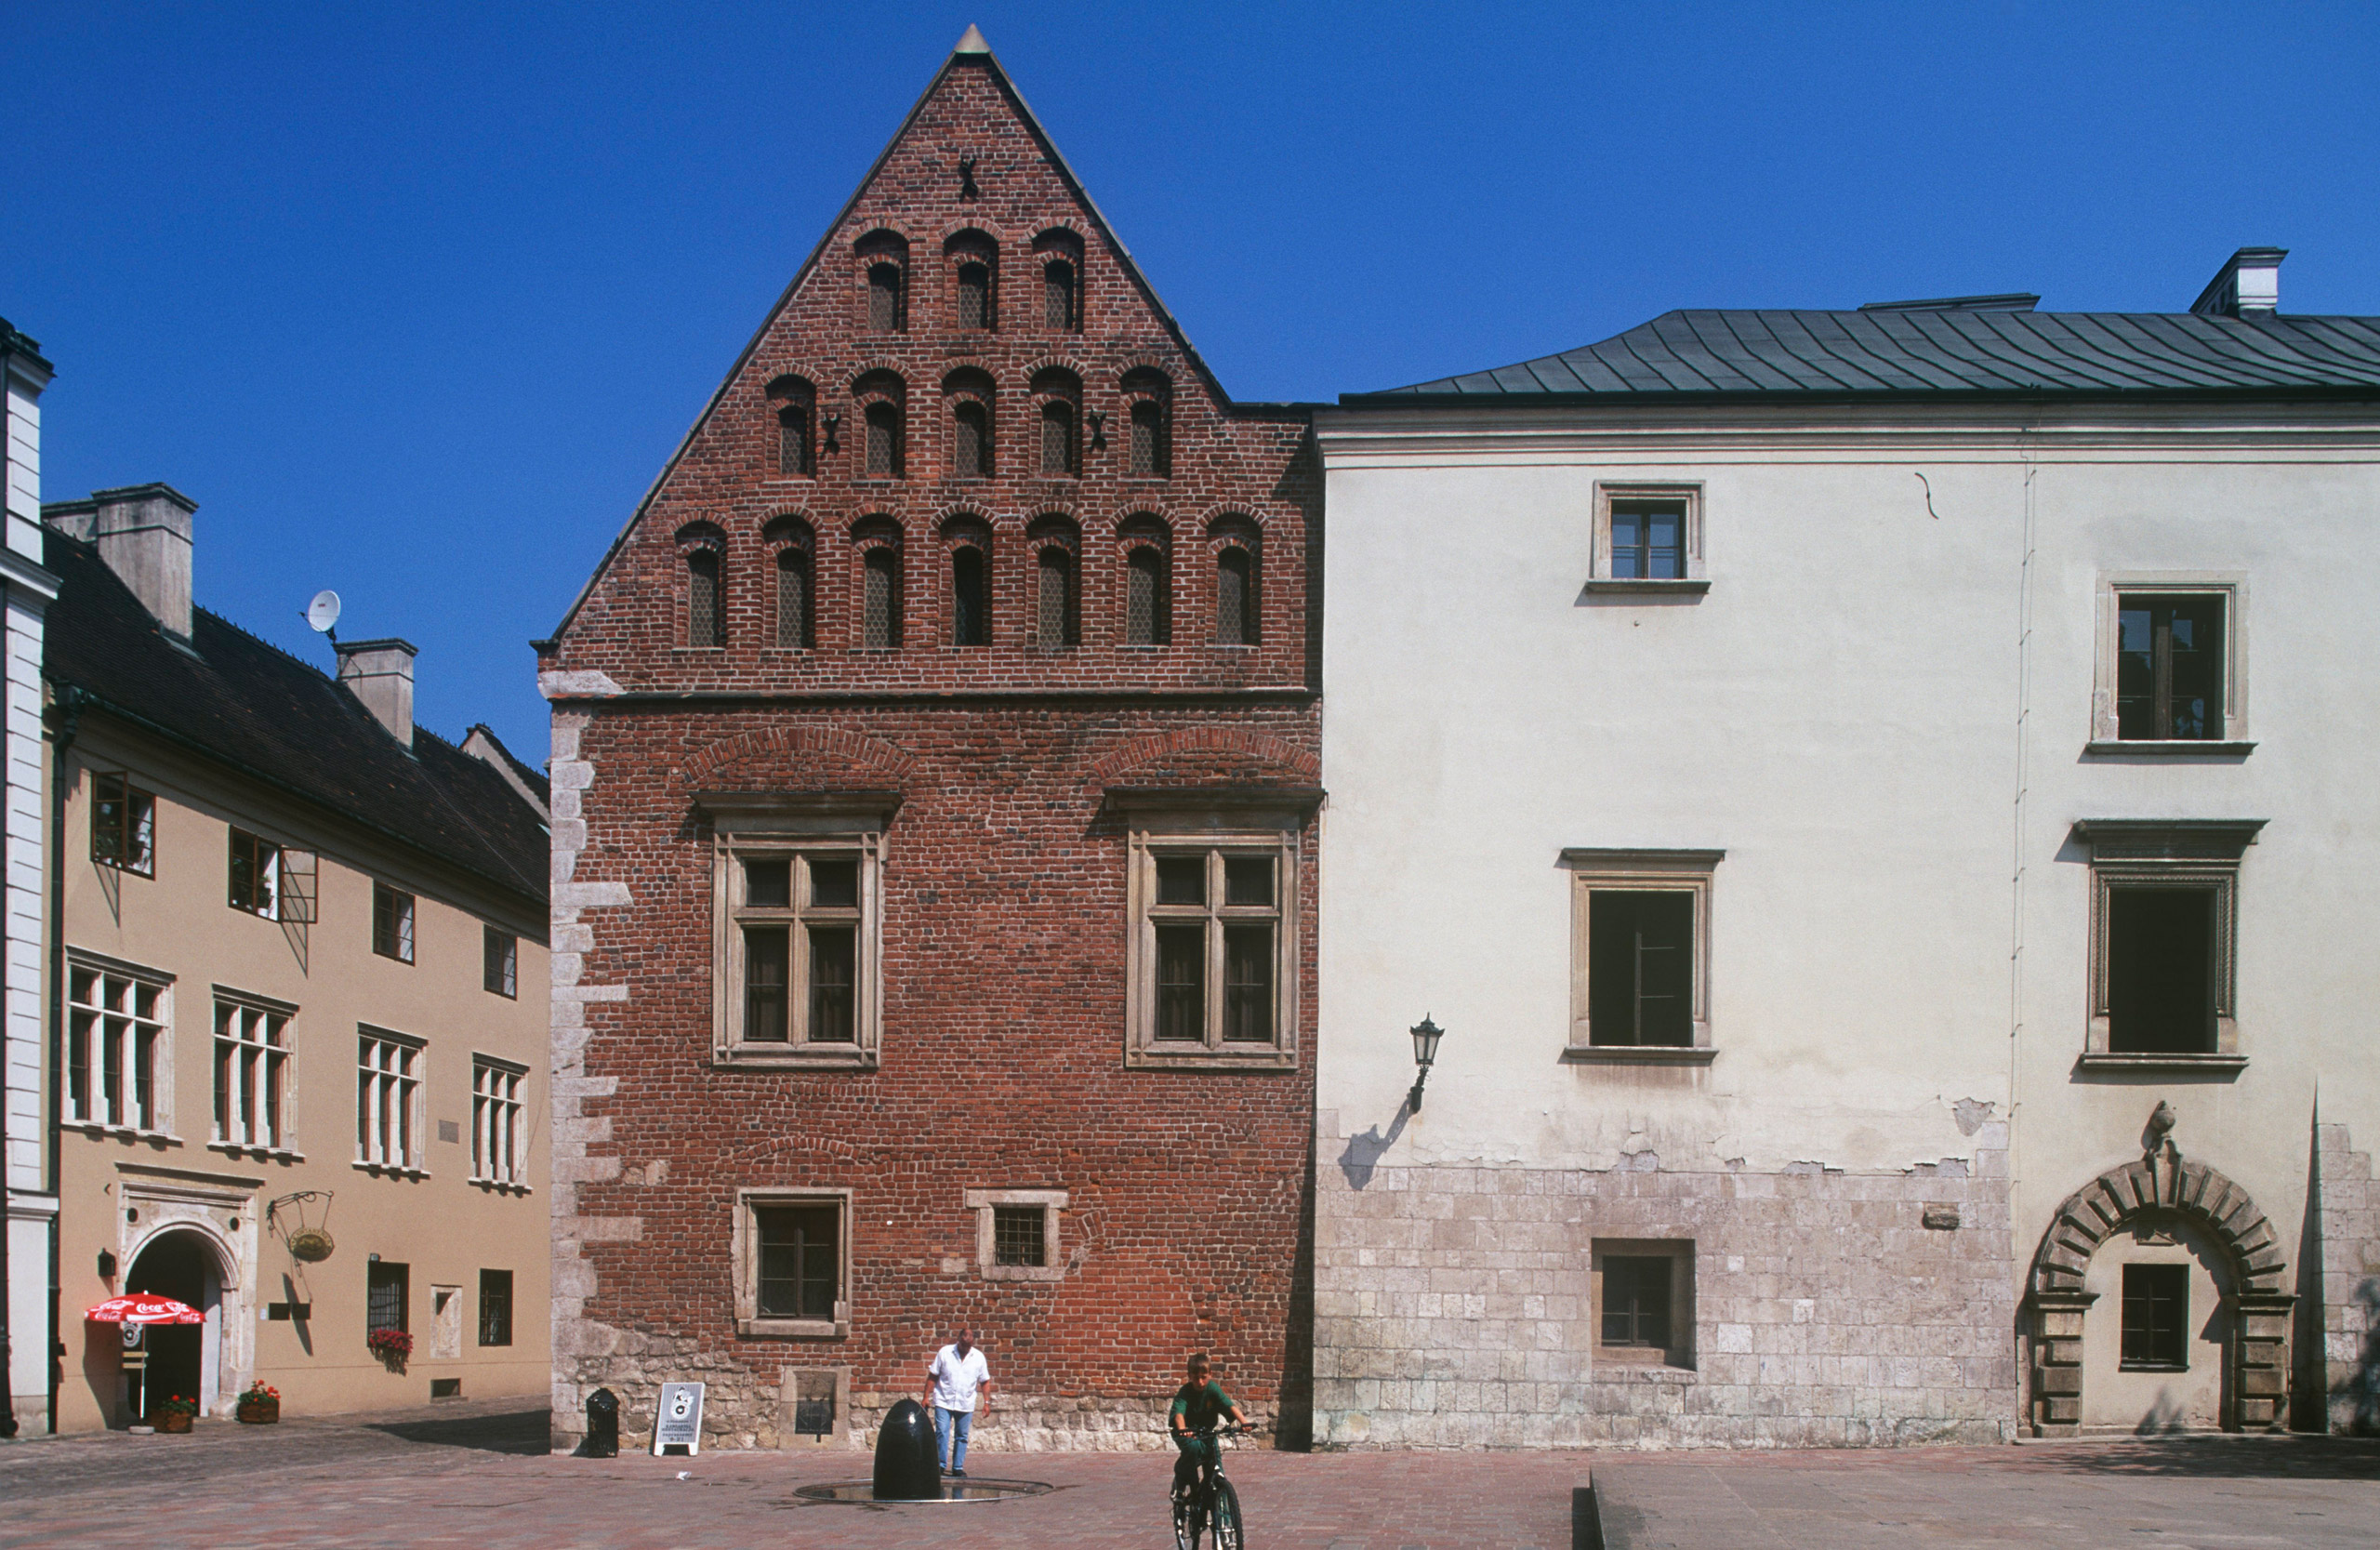 Krakow Historic Centre in Poland.